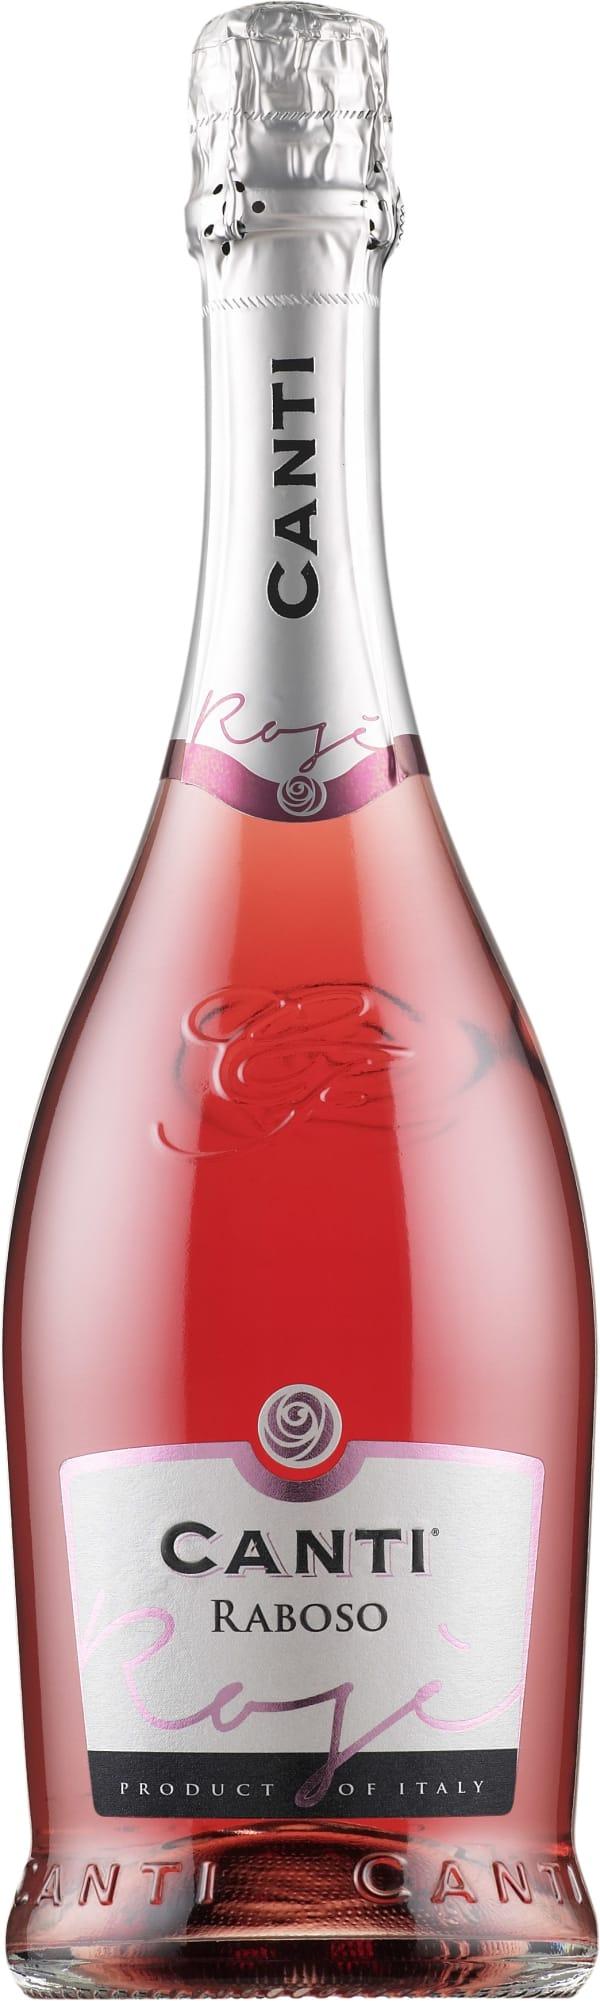 Canti Raboso Rosé Extra Dry